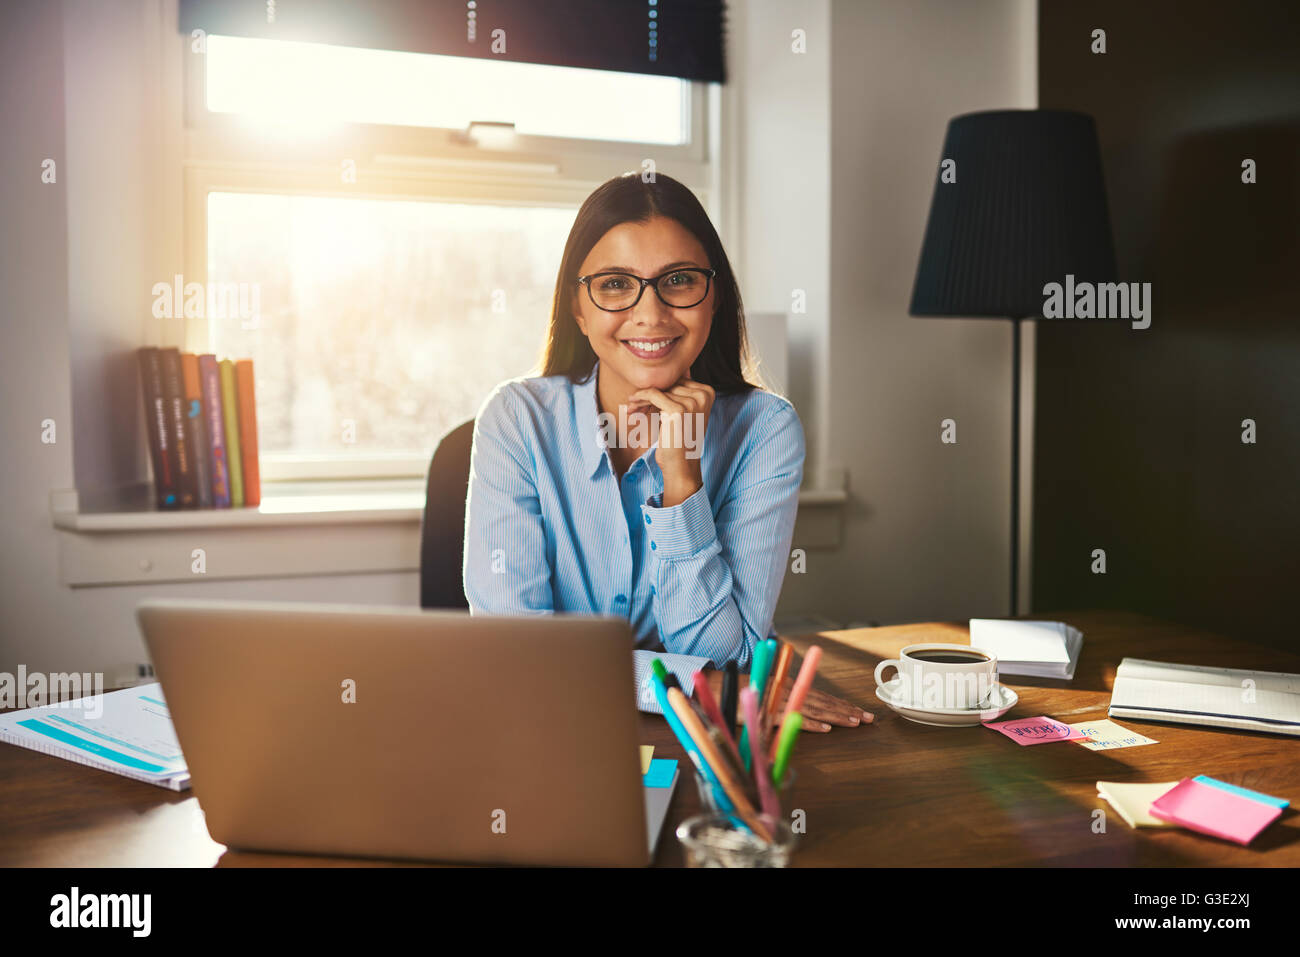 Female entrepreneur sitting at desk smiling at camera - Stock Image